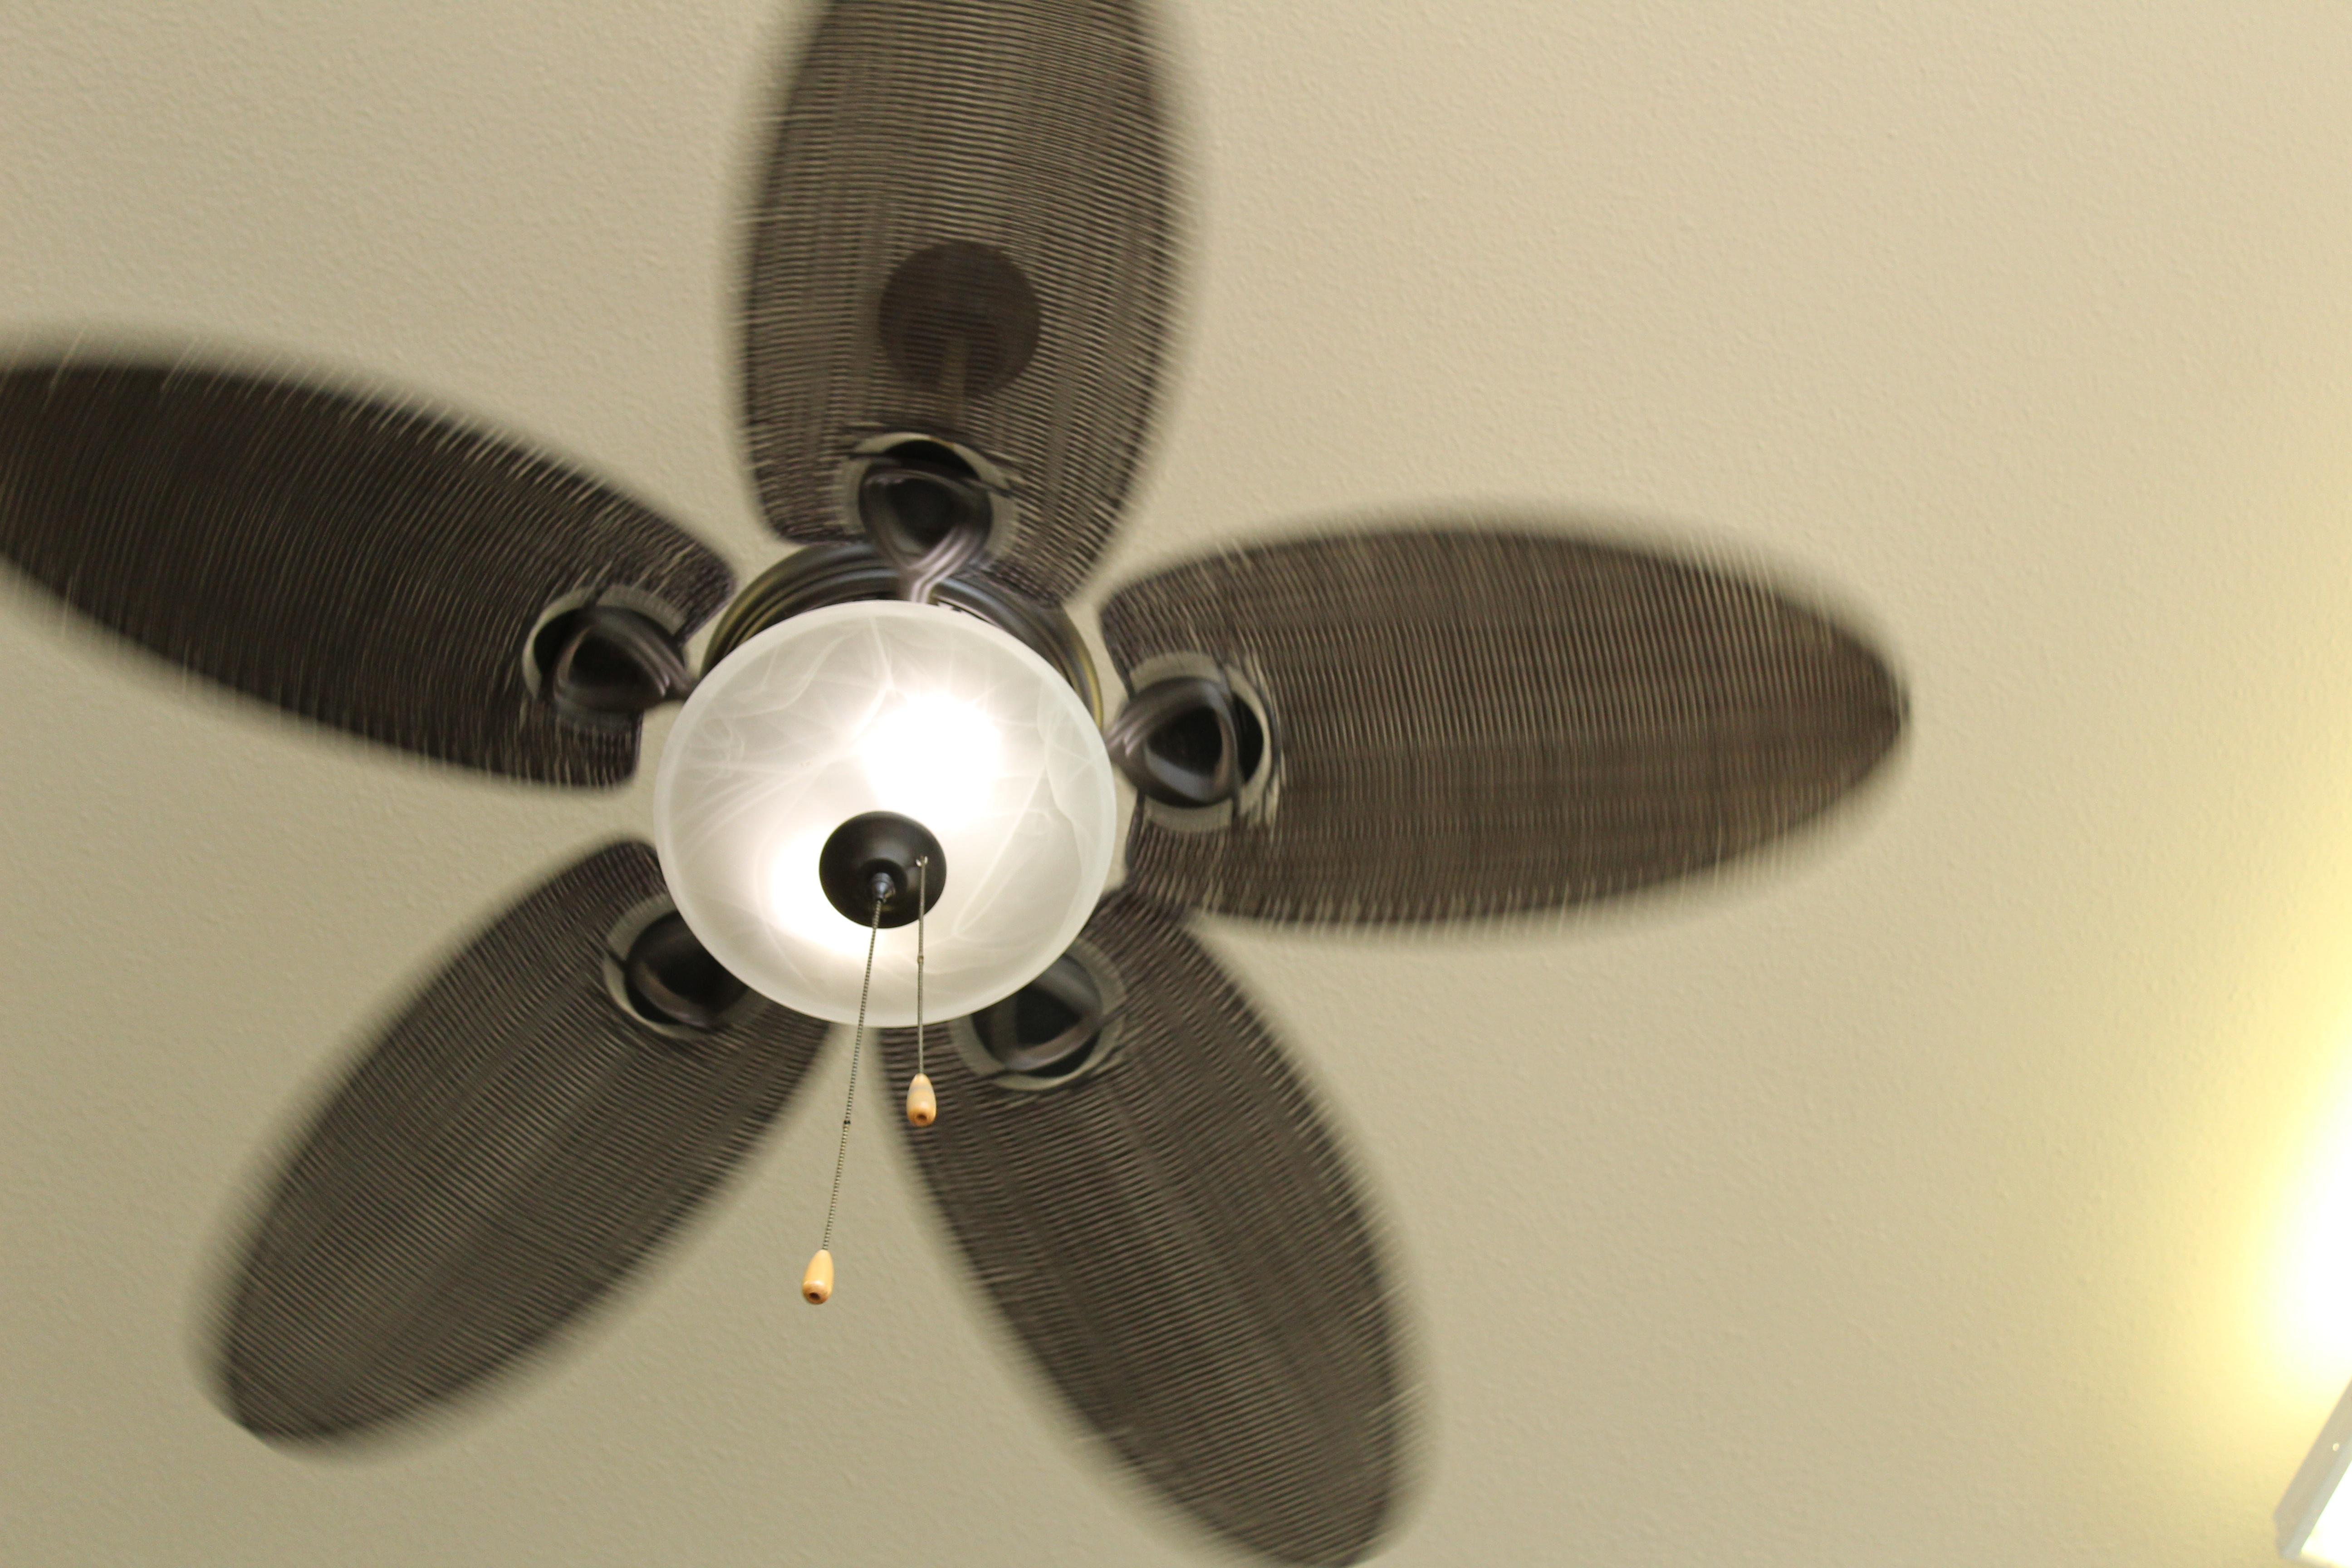 Kostenlose foto : Flügel, Produkt, Propeller, Haushaltsgerät ...